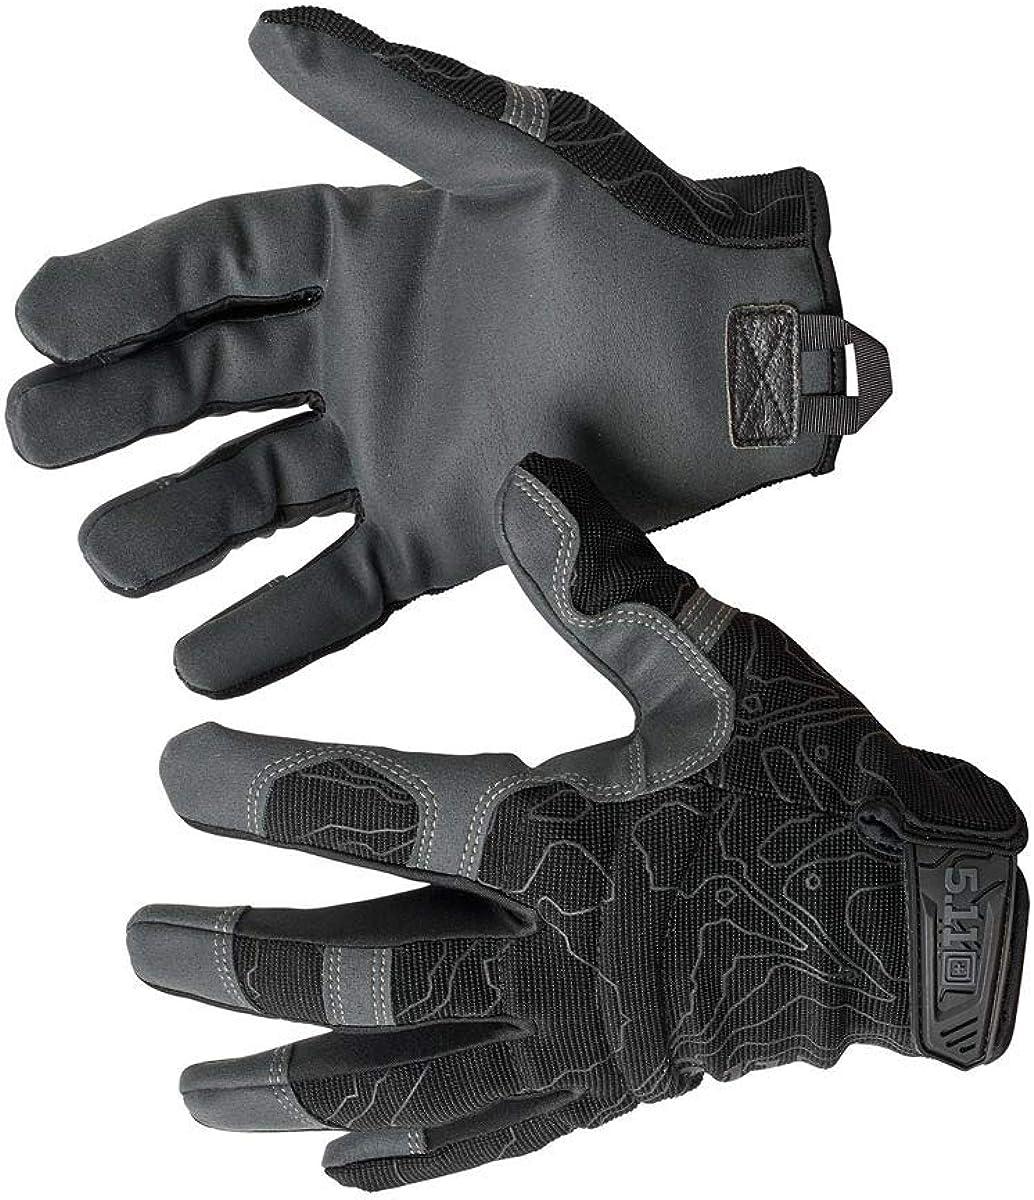 Bombing free shipping 5.11 High Abrasion Tac Japan Maker New Glove Finger Men's Full Abr Military